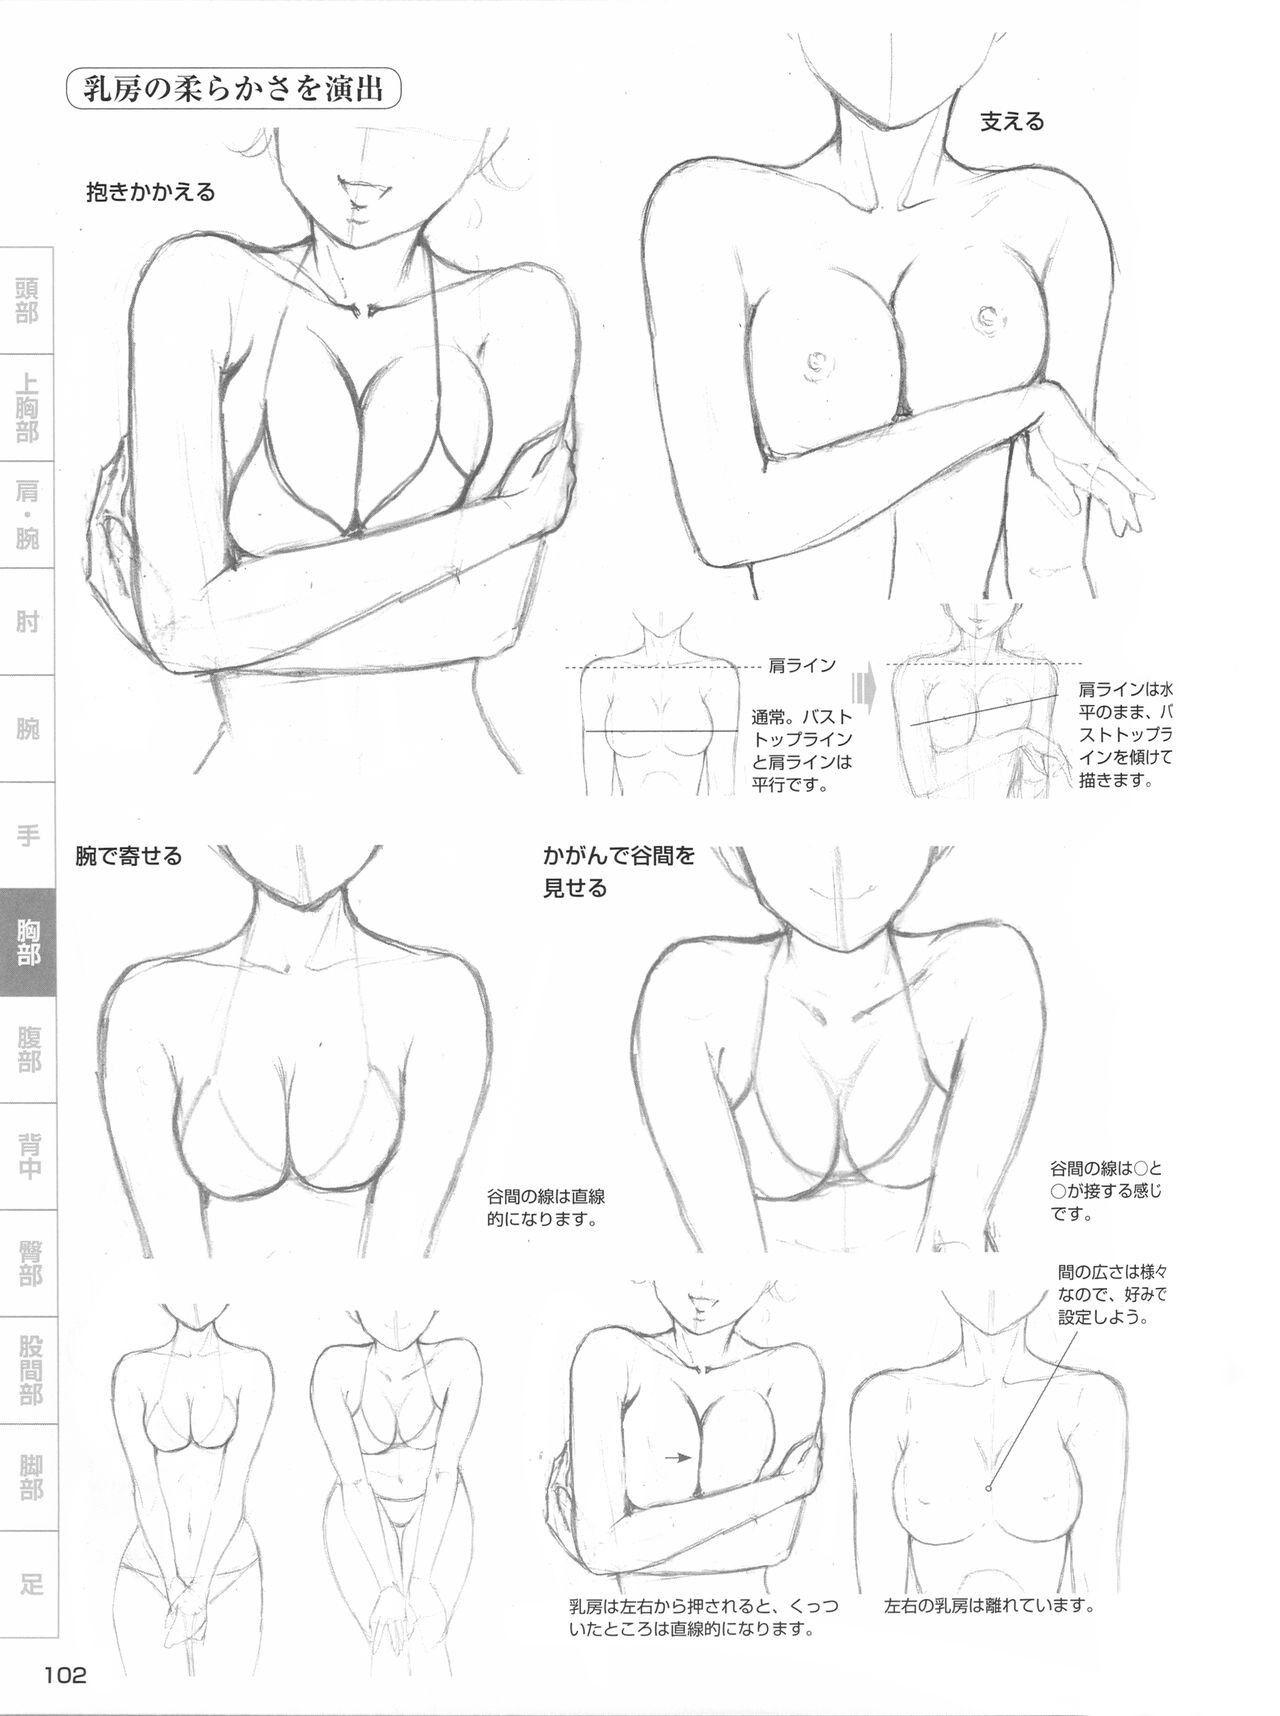 Pin de GaoJiyun en fragment | Pinterest | Anatomía, Dibujo y Bocetos